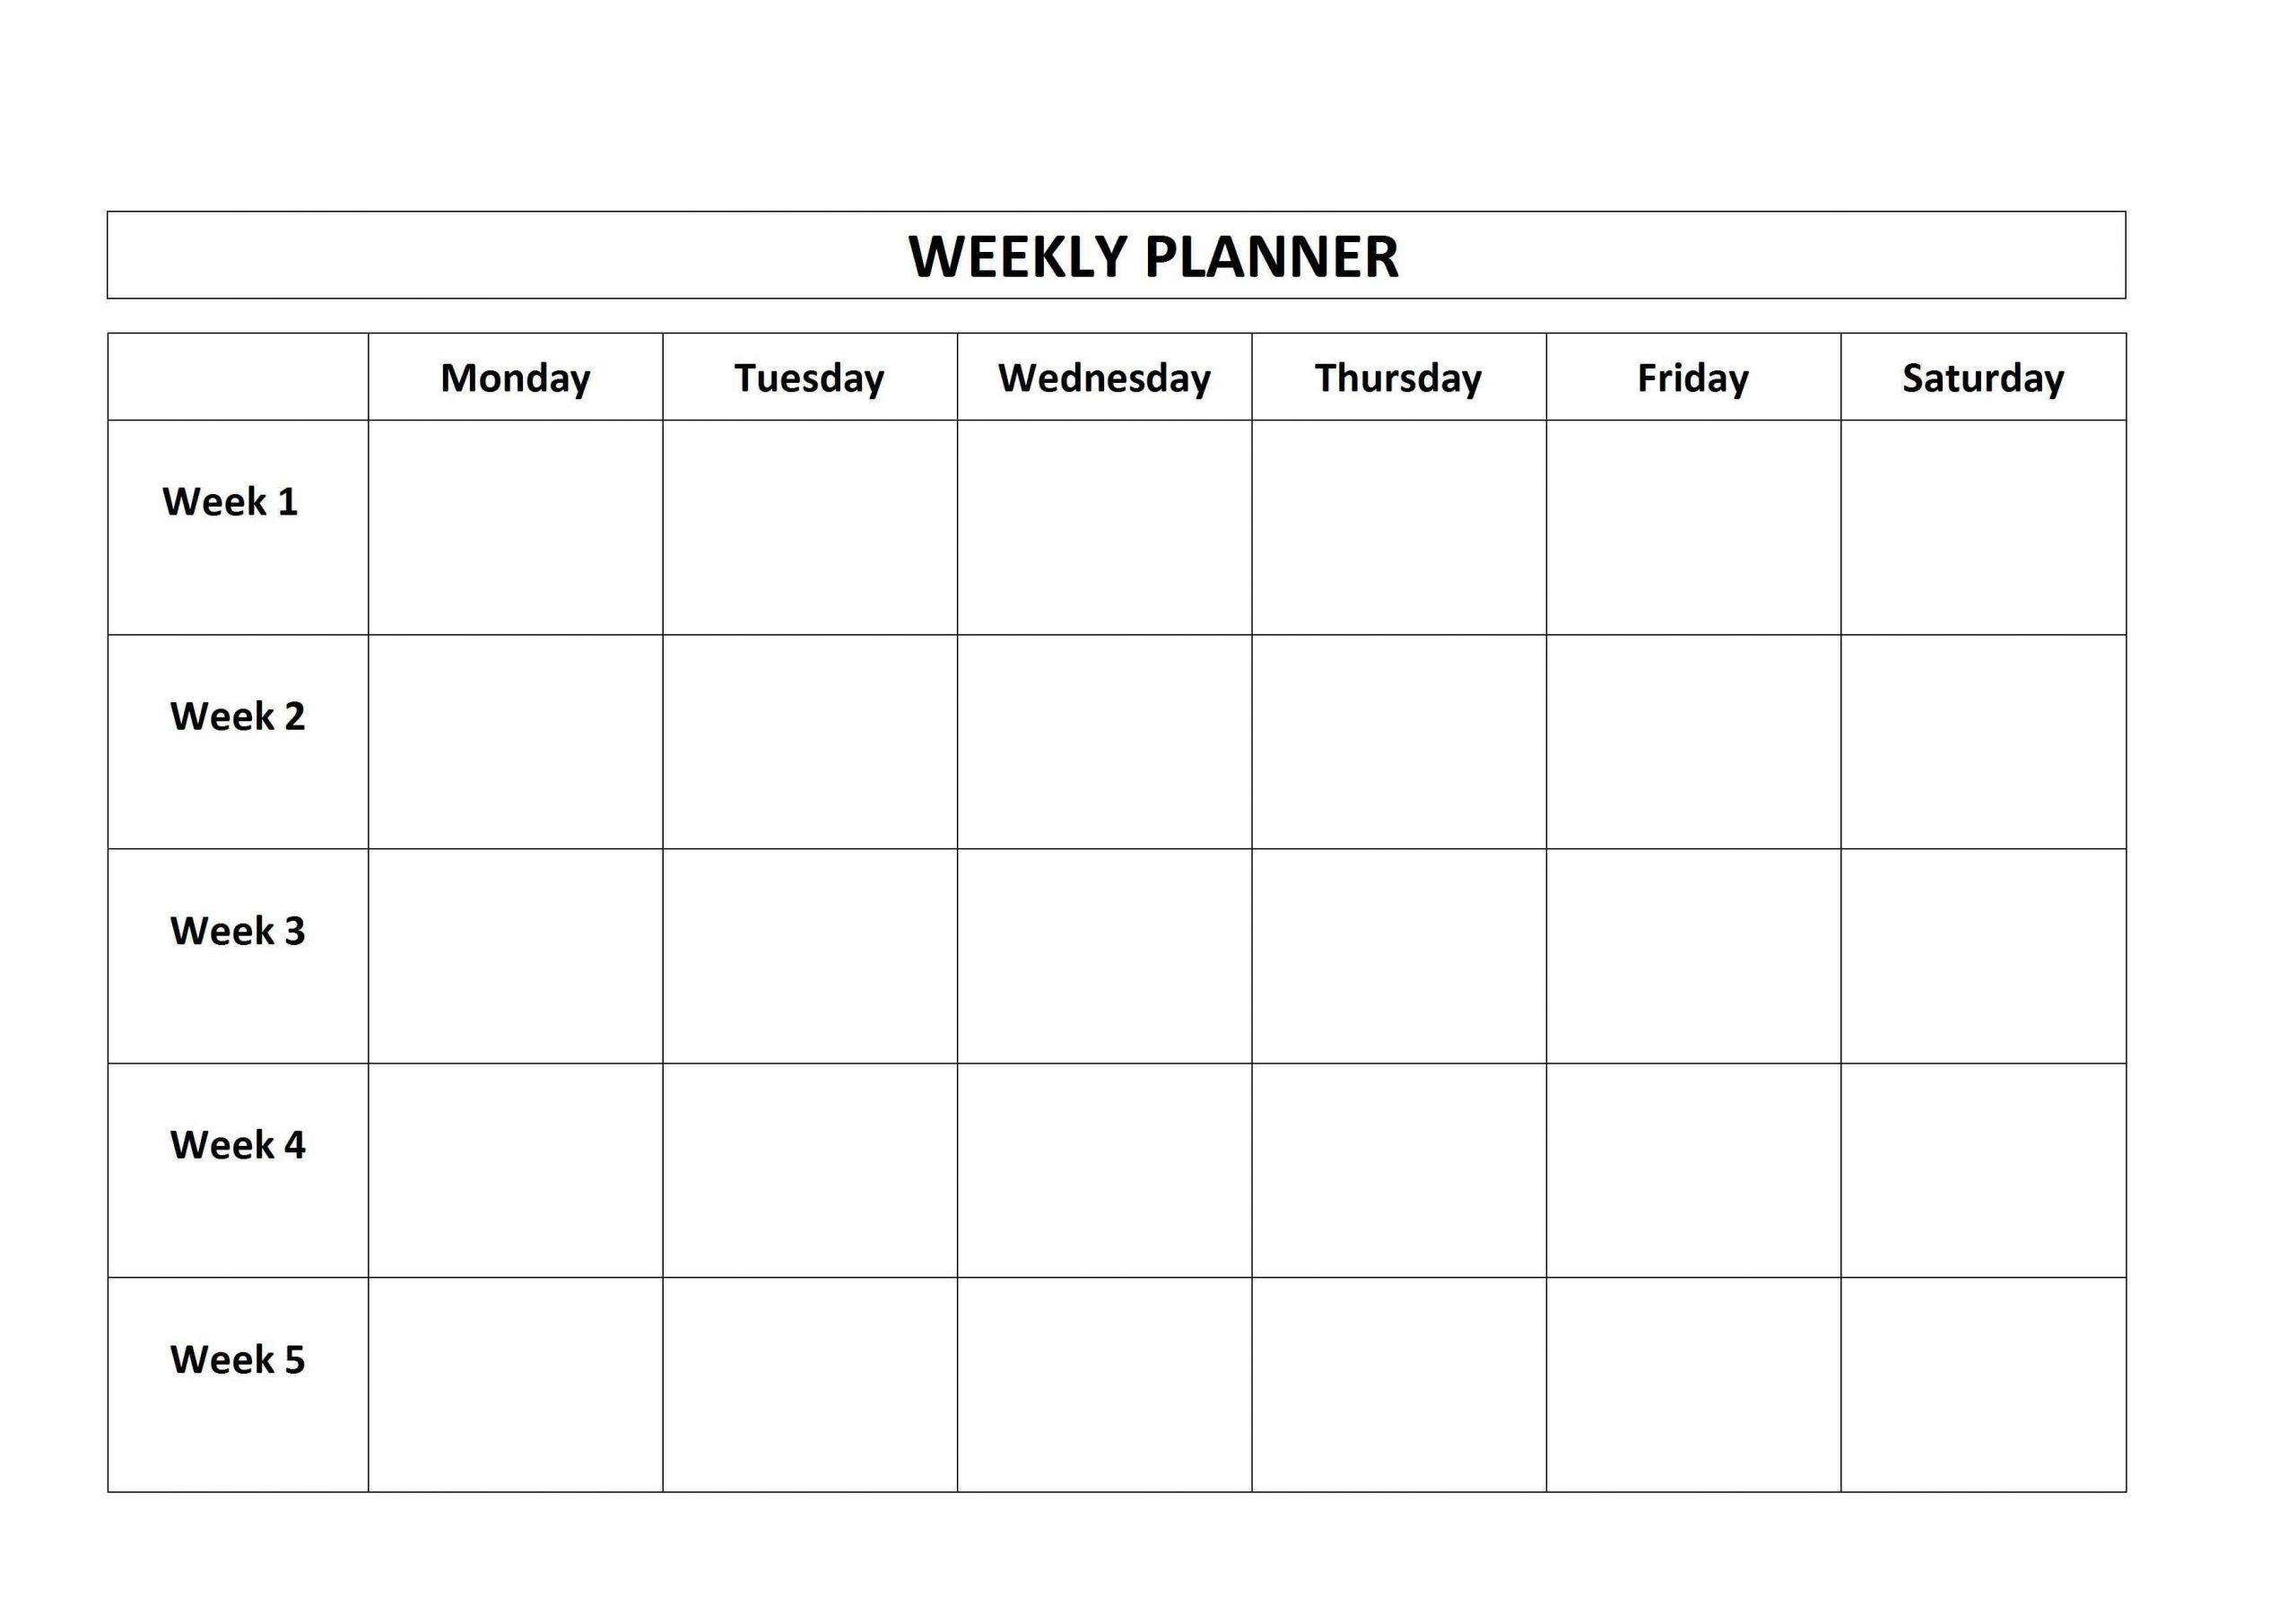 Blank Monday Through Friday Calendars | Example Calendar Free Printable Monday Thru Sunday Calendars